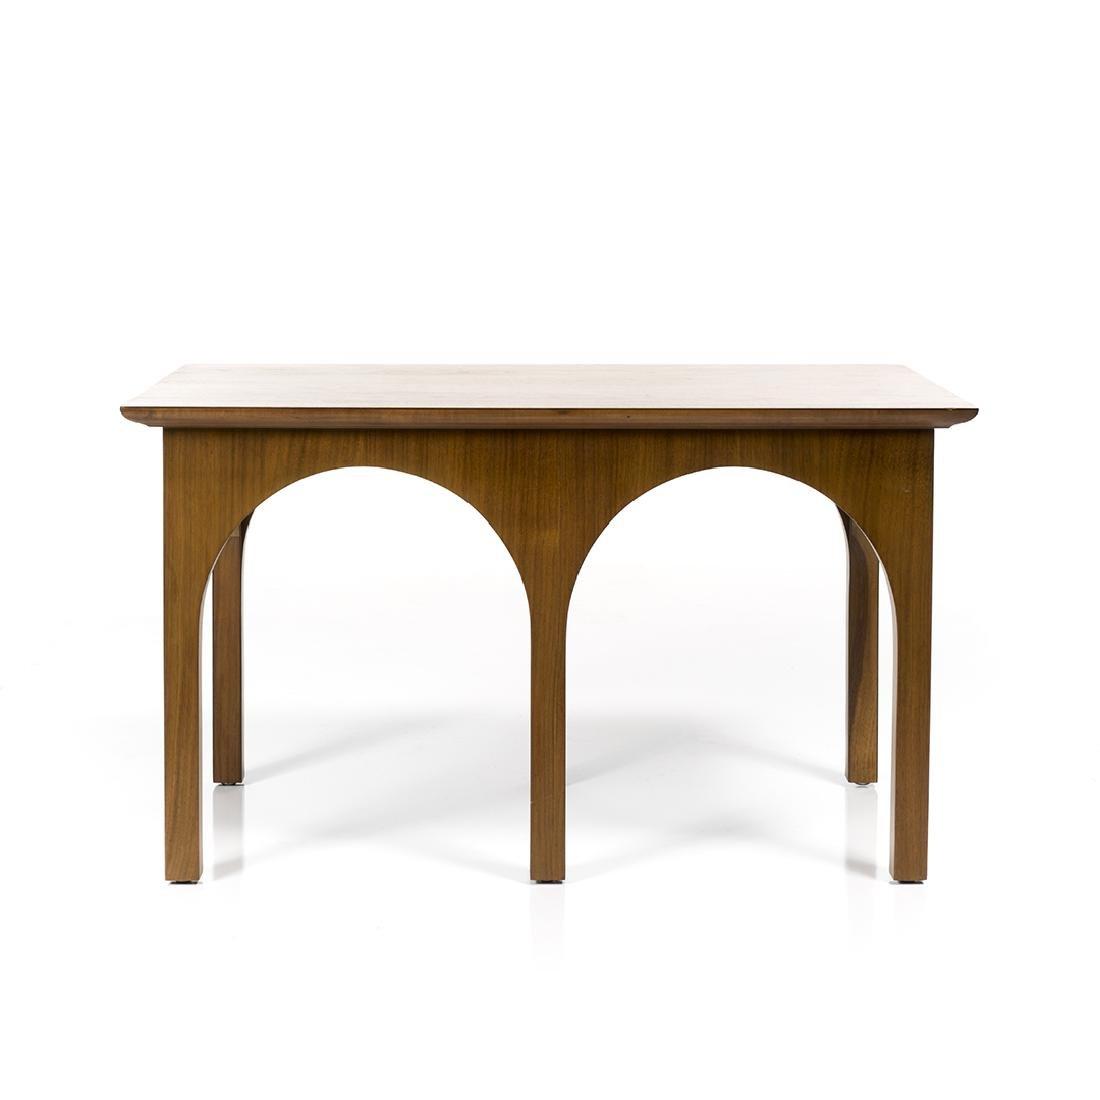 T.H. Robsjohn-Gibbings Coffee Table - 2